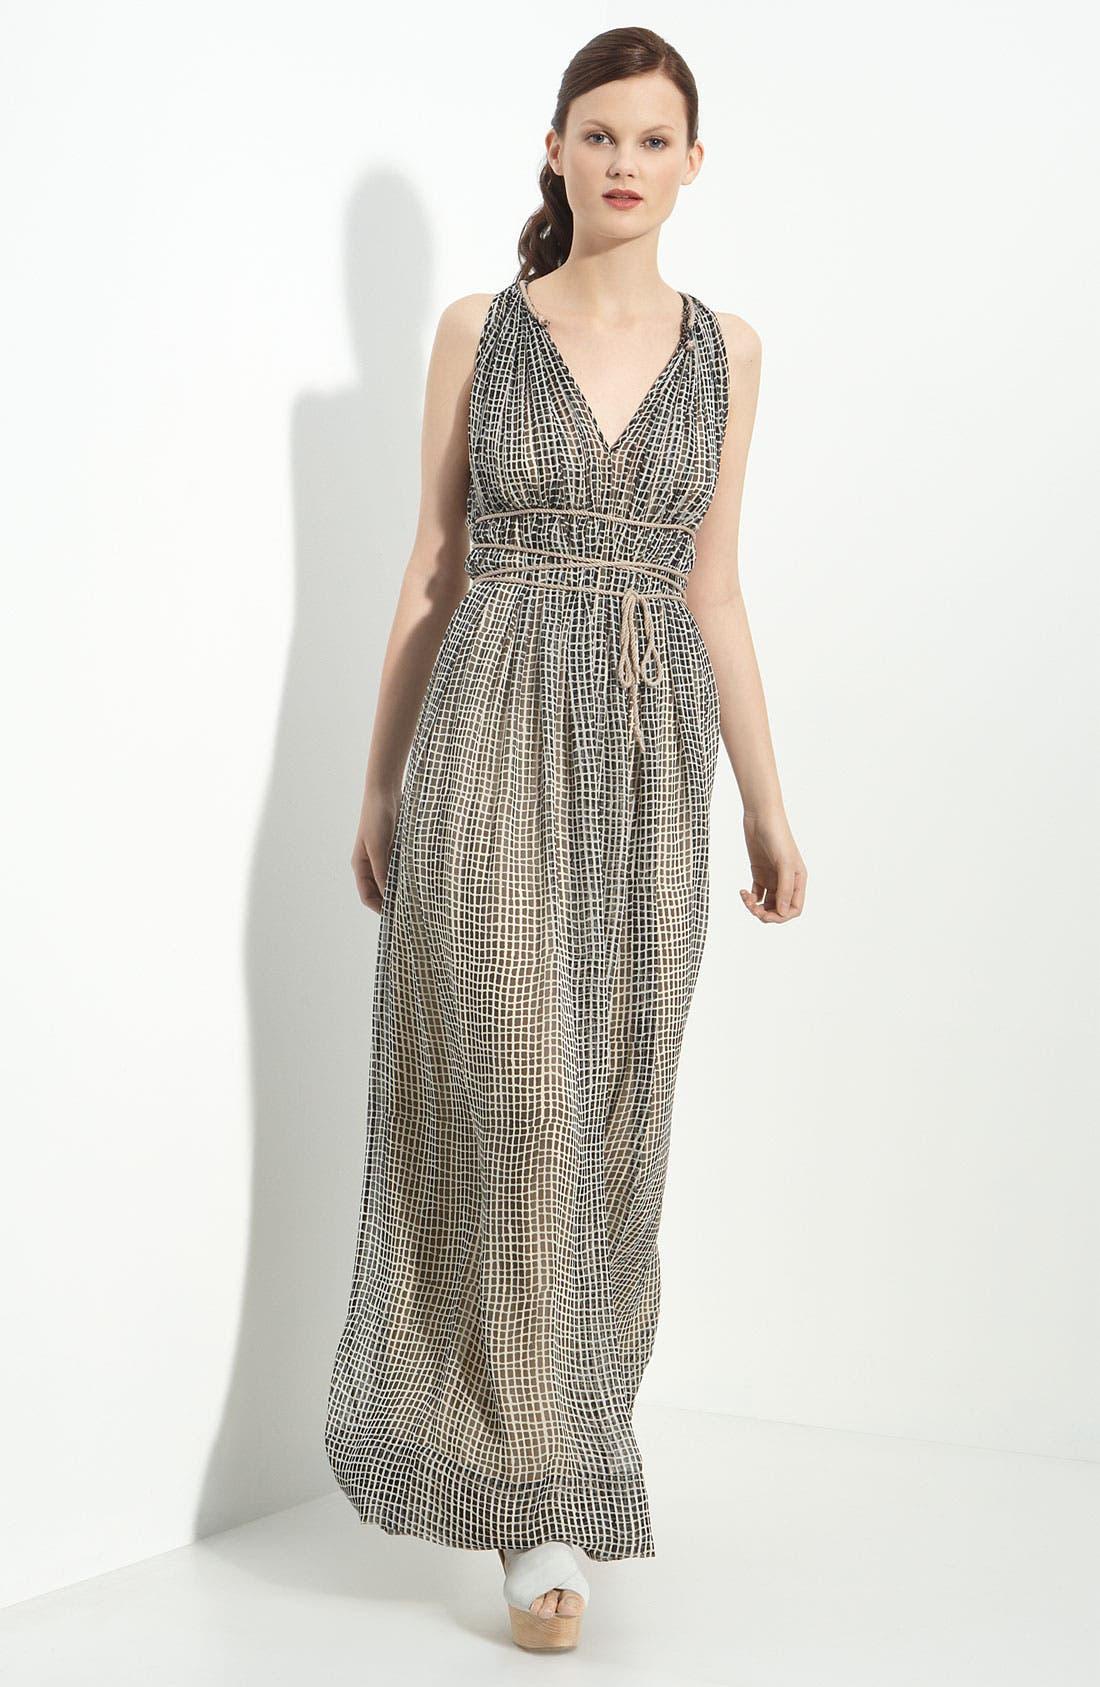 Main Image - 3.1 Phillip Lim Painted Check Print Silk Maxi Dress